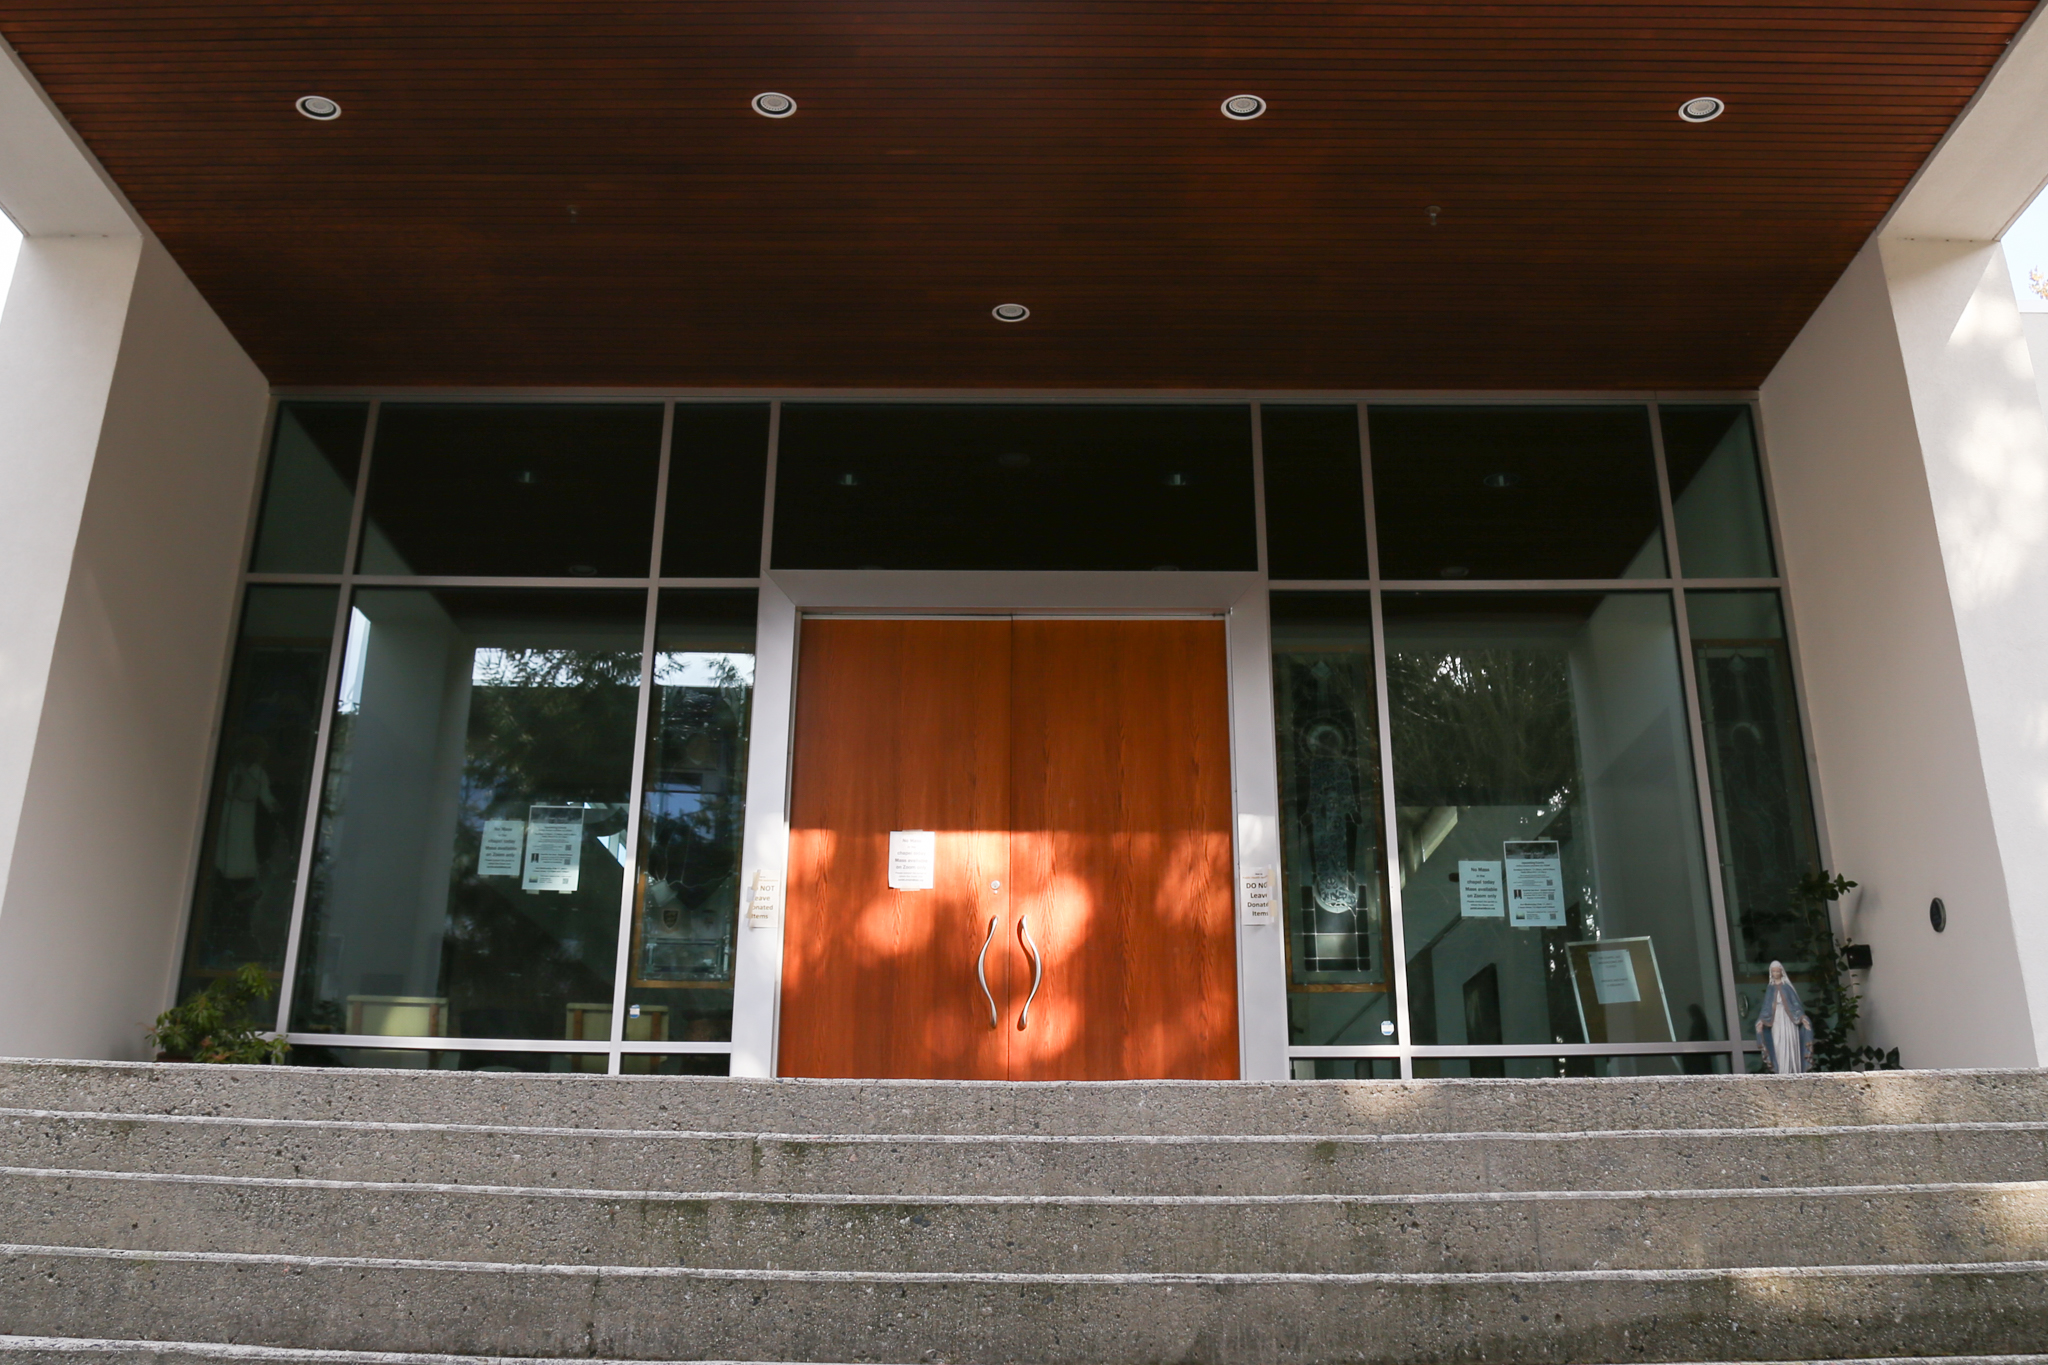 The entrance to St. Mark's Parish at UBC.